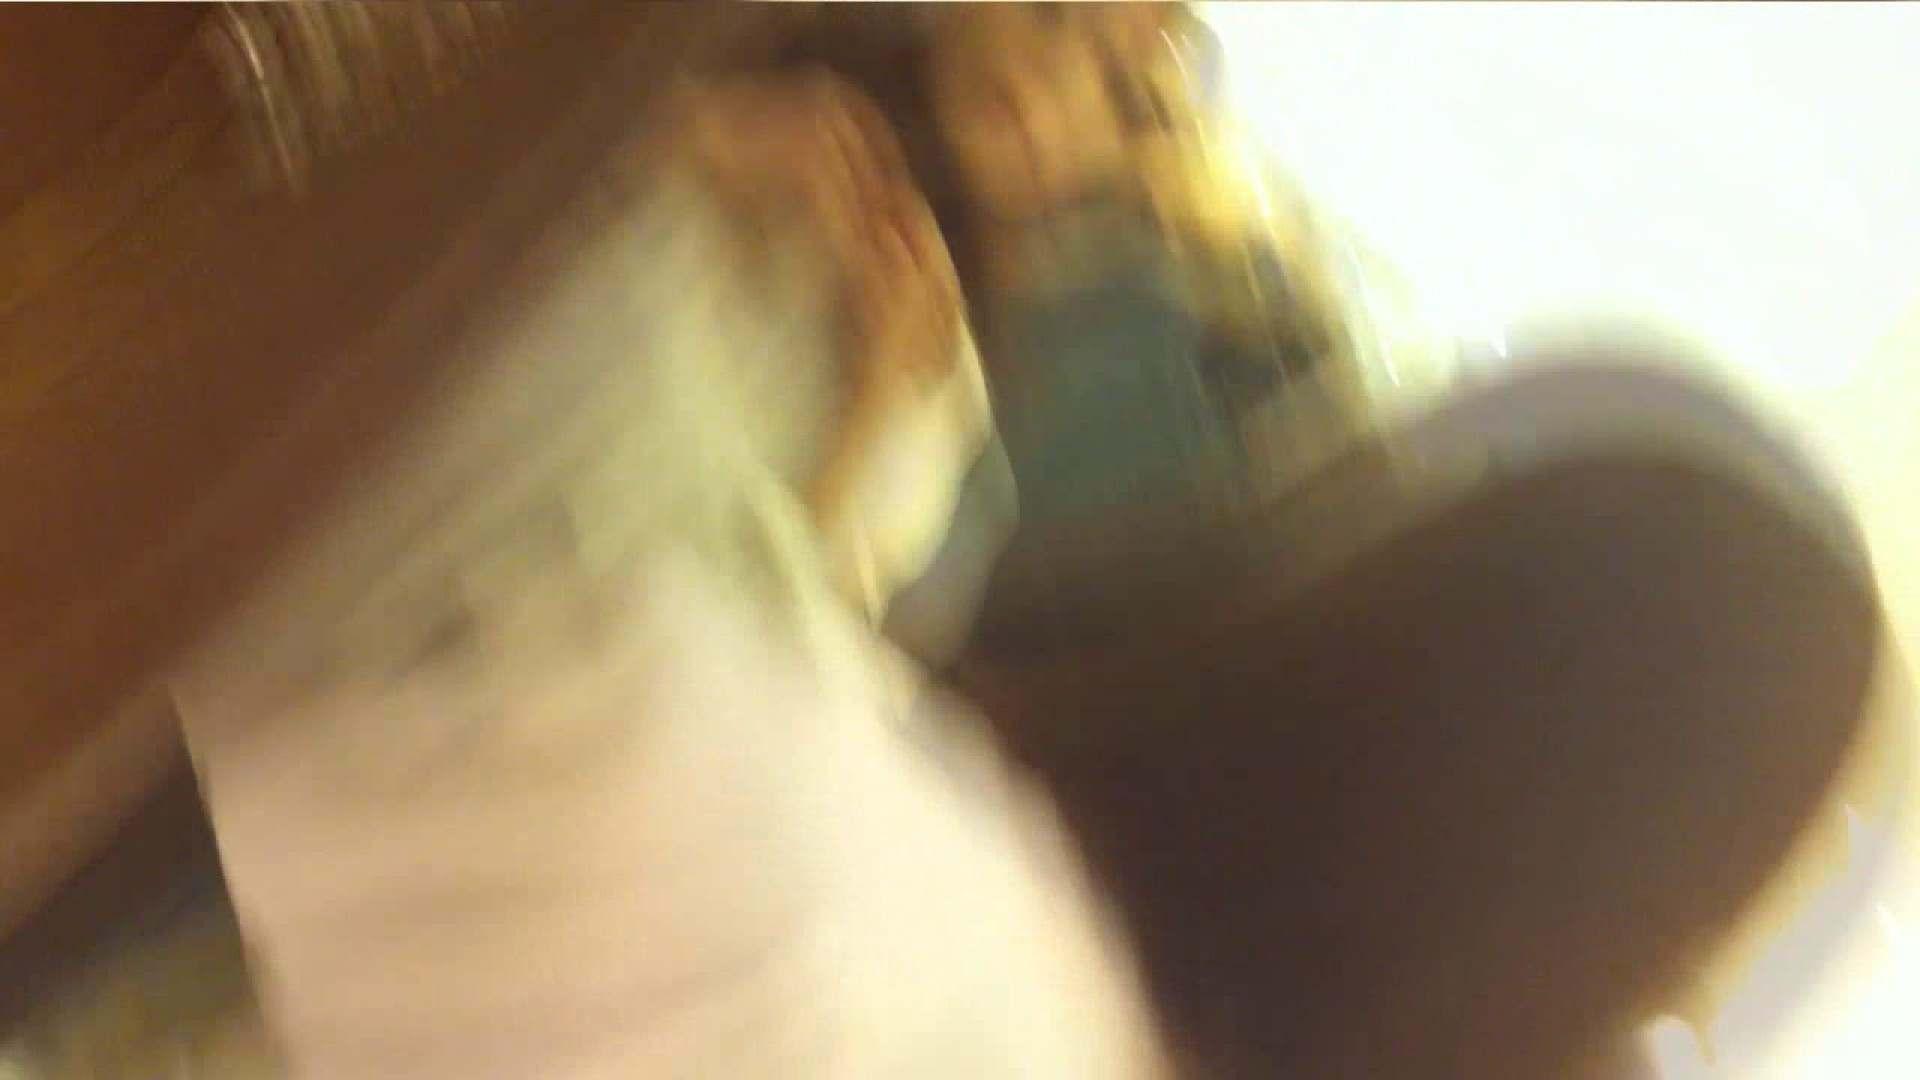 vol.40 美人アパレル胸チラ&パンチラ もっこりパンチラ! パンチラ スケベ動画紹介 109PICs 51